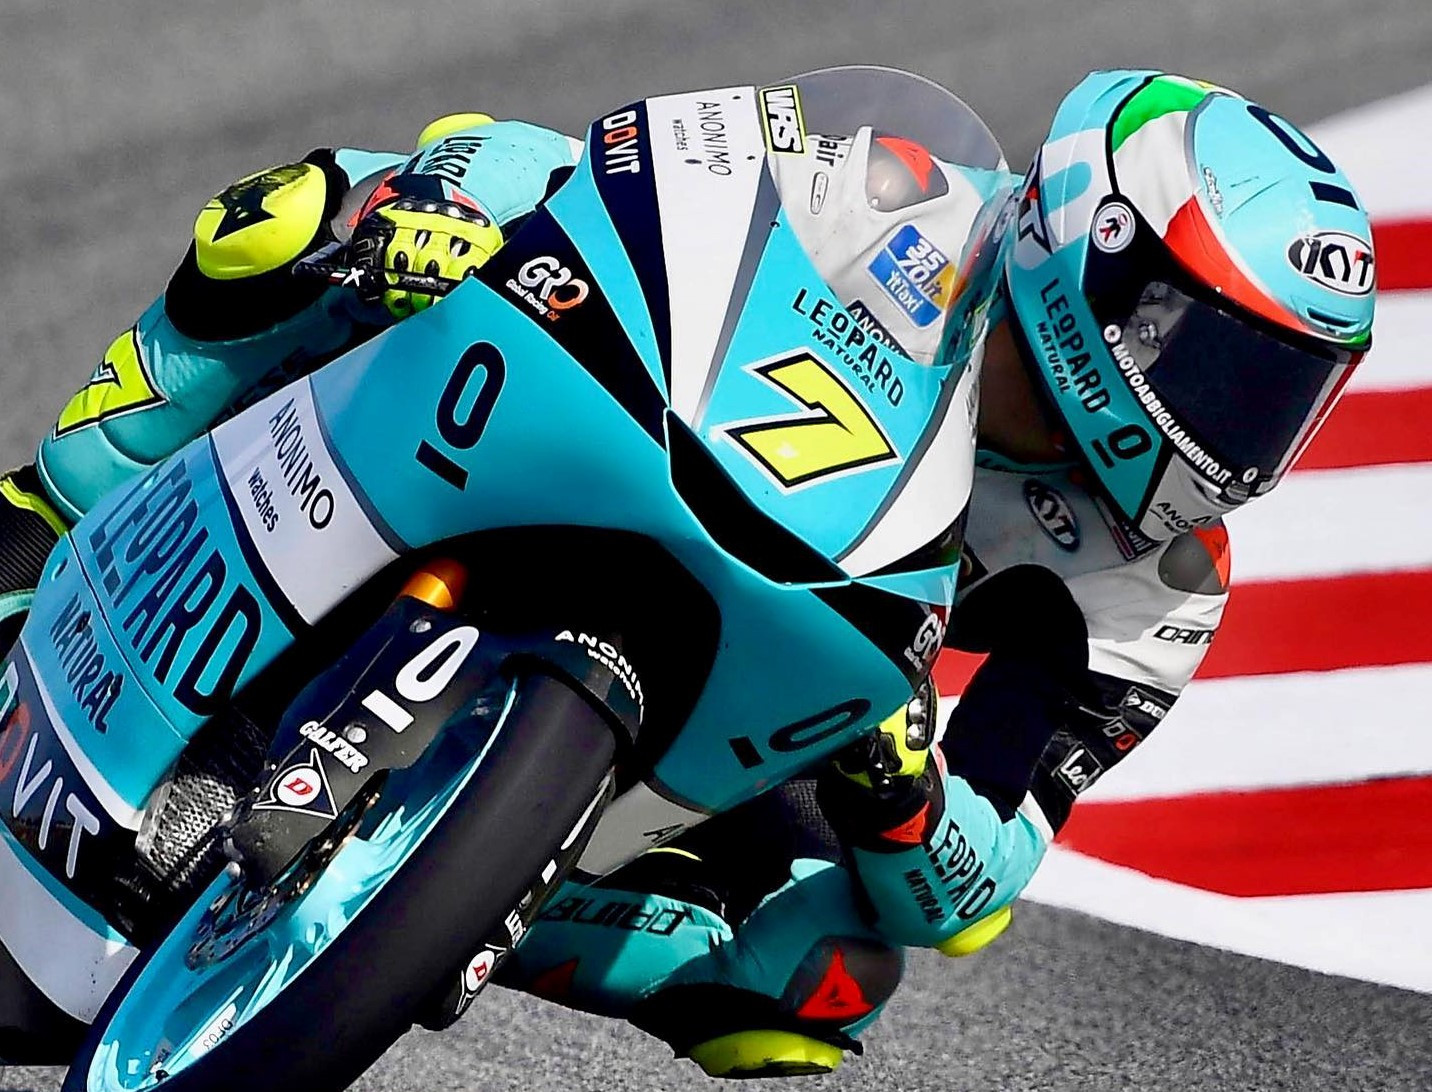 Dennis Foggia (7). Photo courtesy Leopard Racing.